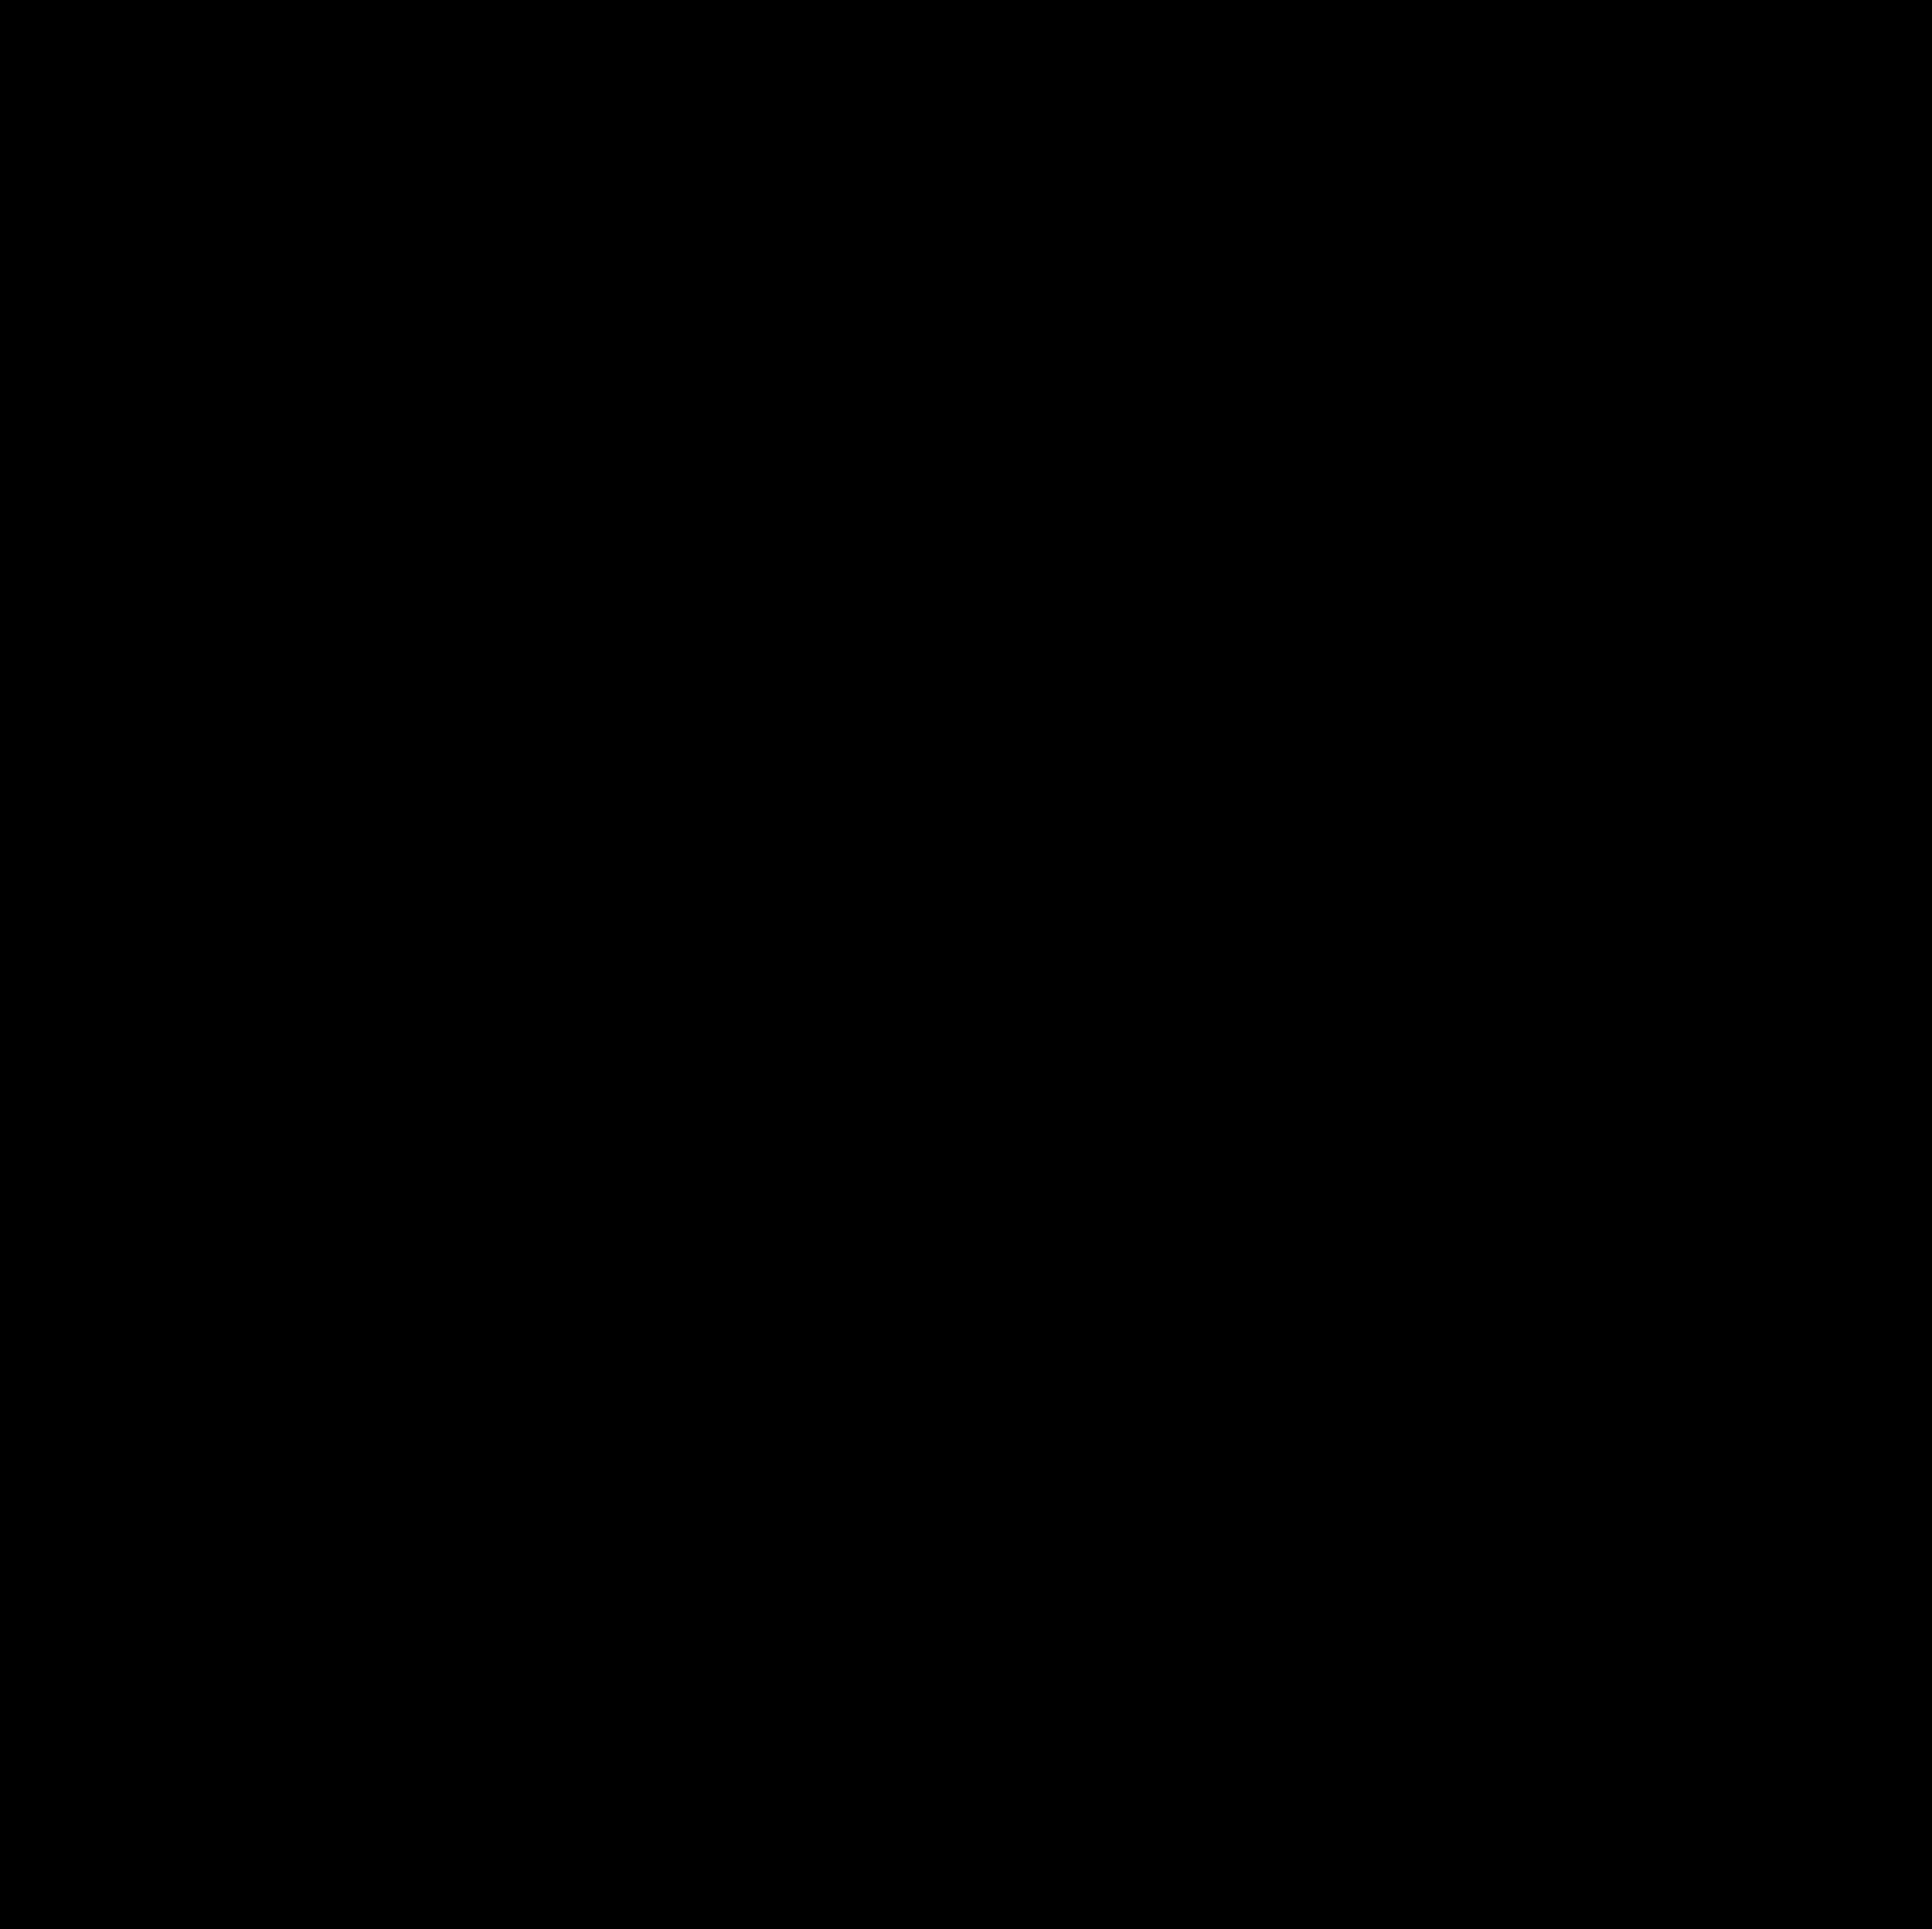 img_0193